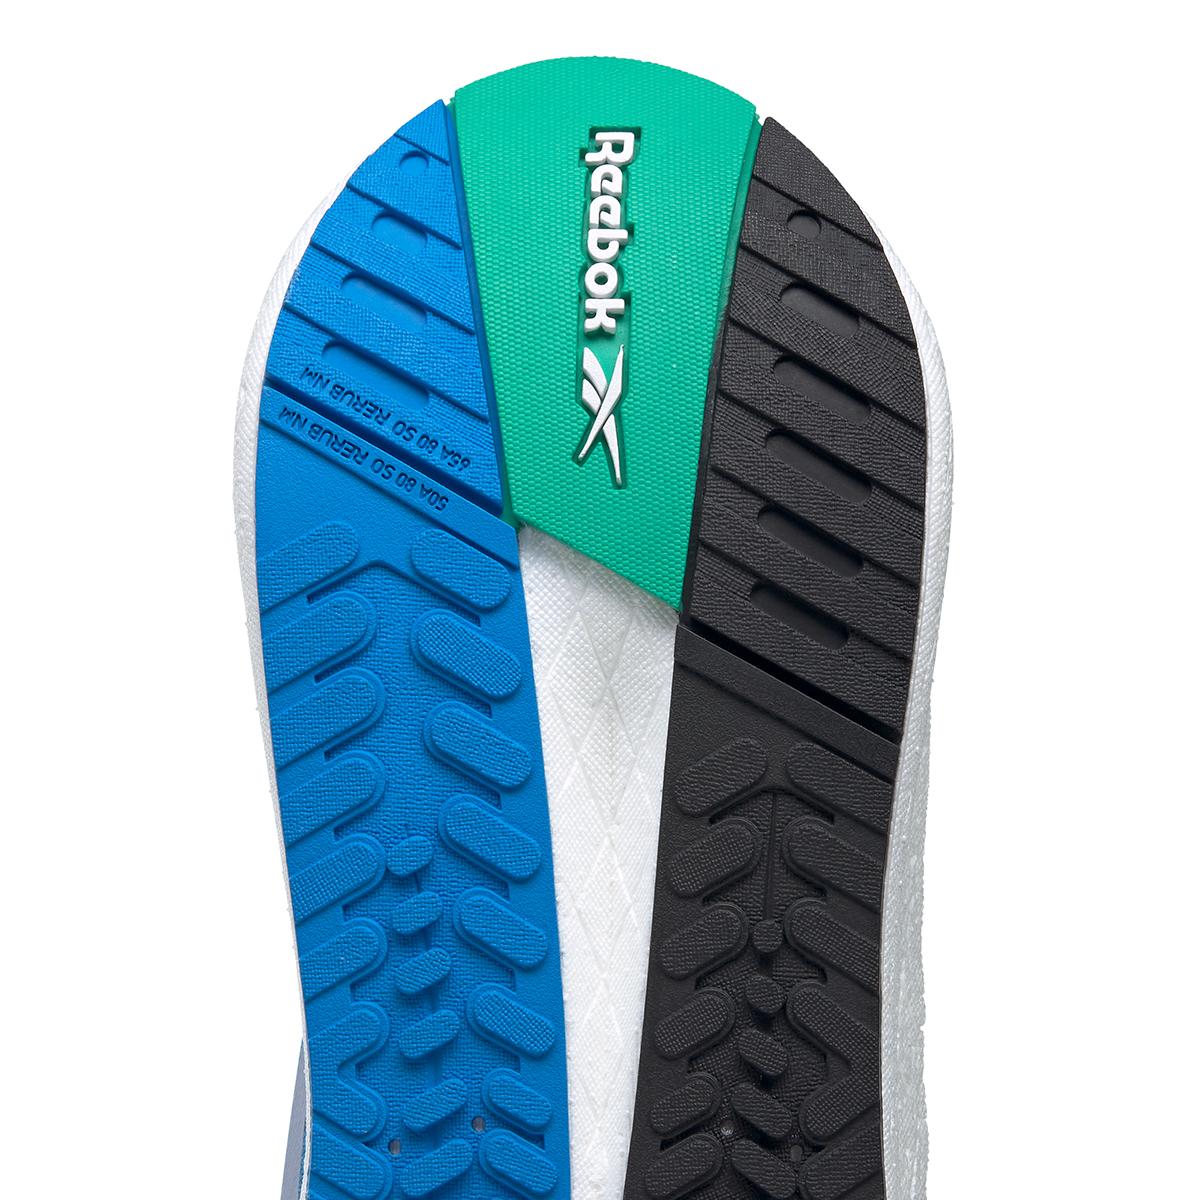 Men's Reebok Floatride Energy Symmetros Running Shoe - Color: Dynamic Blue/Horizon Blue/Court Green - Size: 7 - Width: Regular, Dynamic Blue/Horizon Blue/Court Green, large, image 7